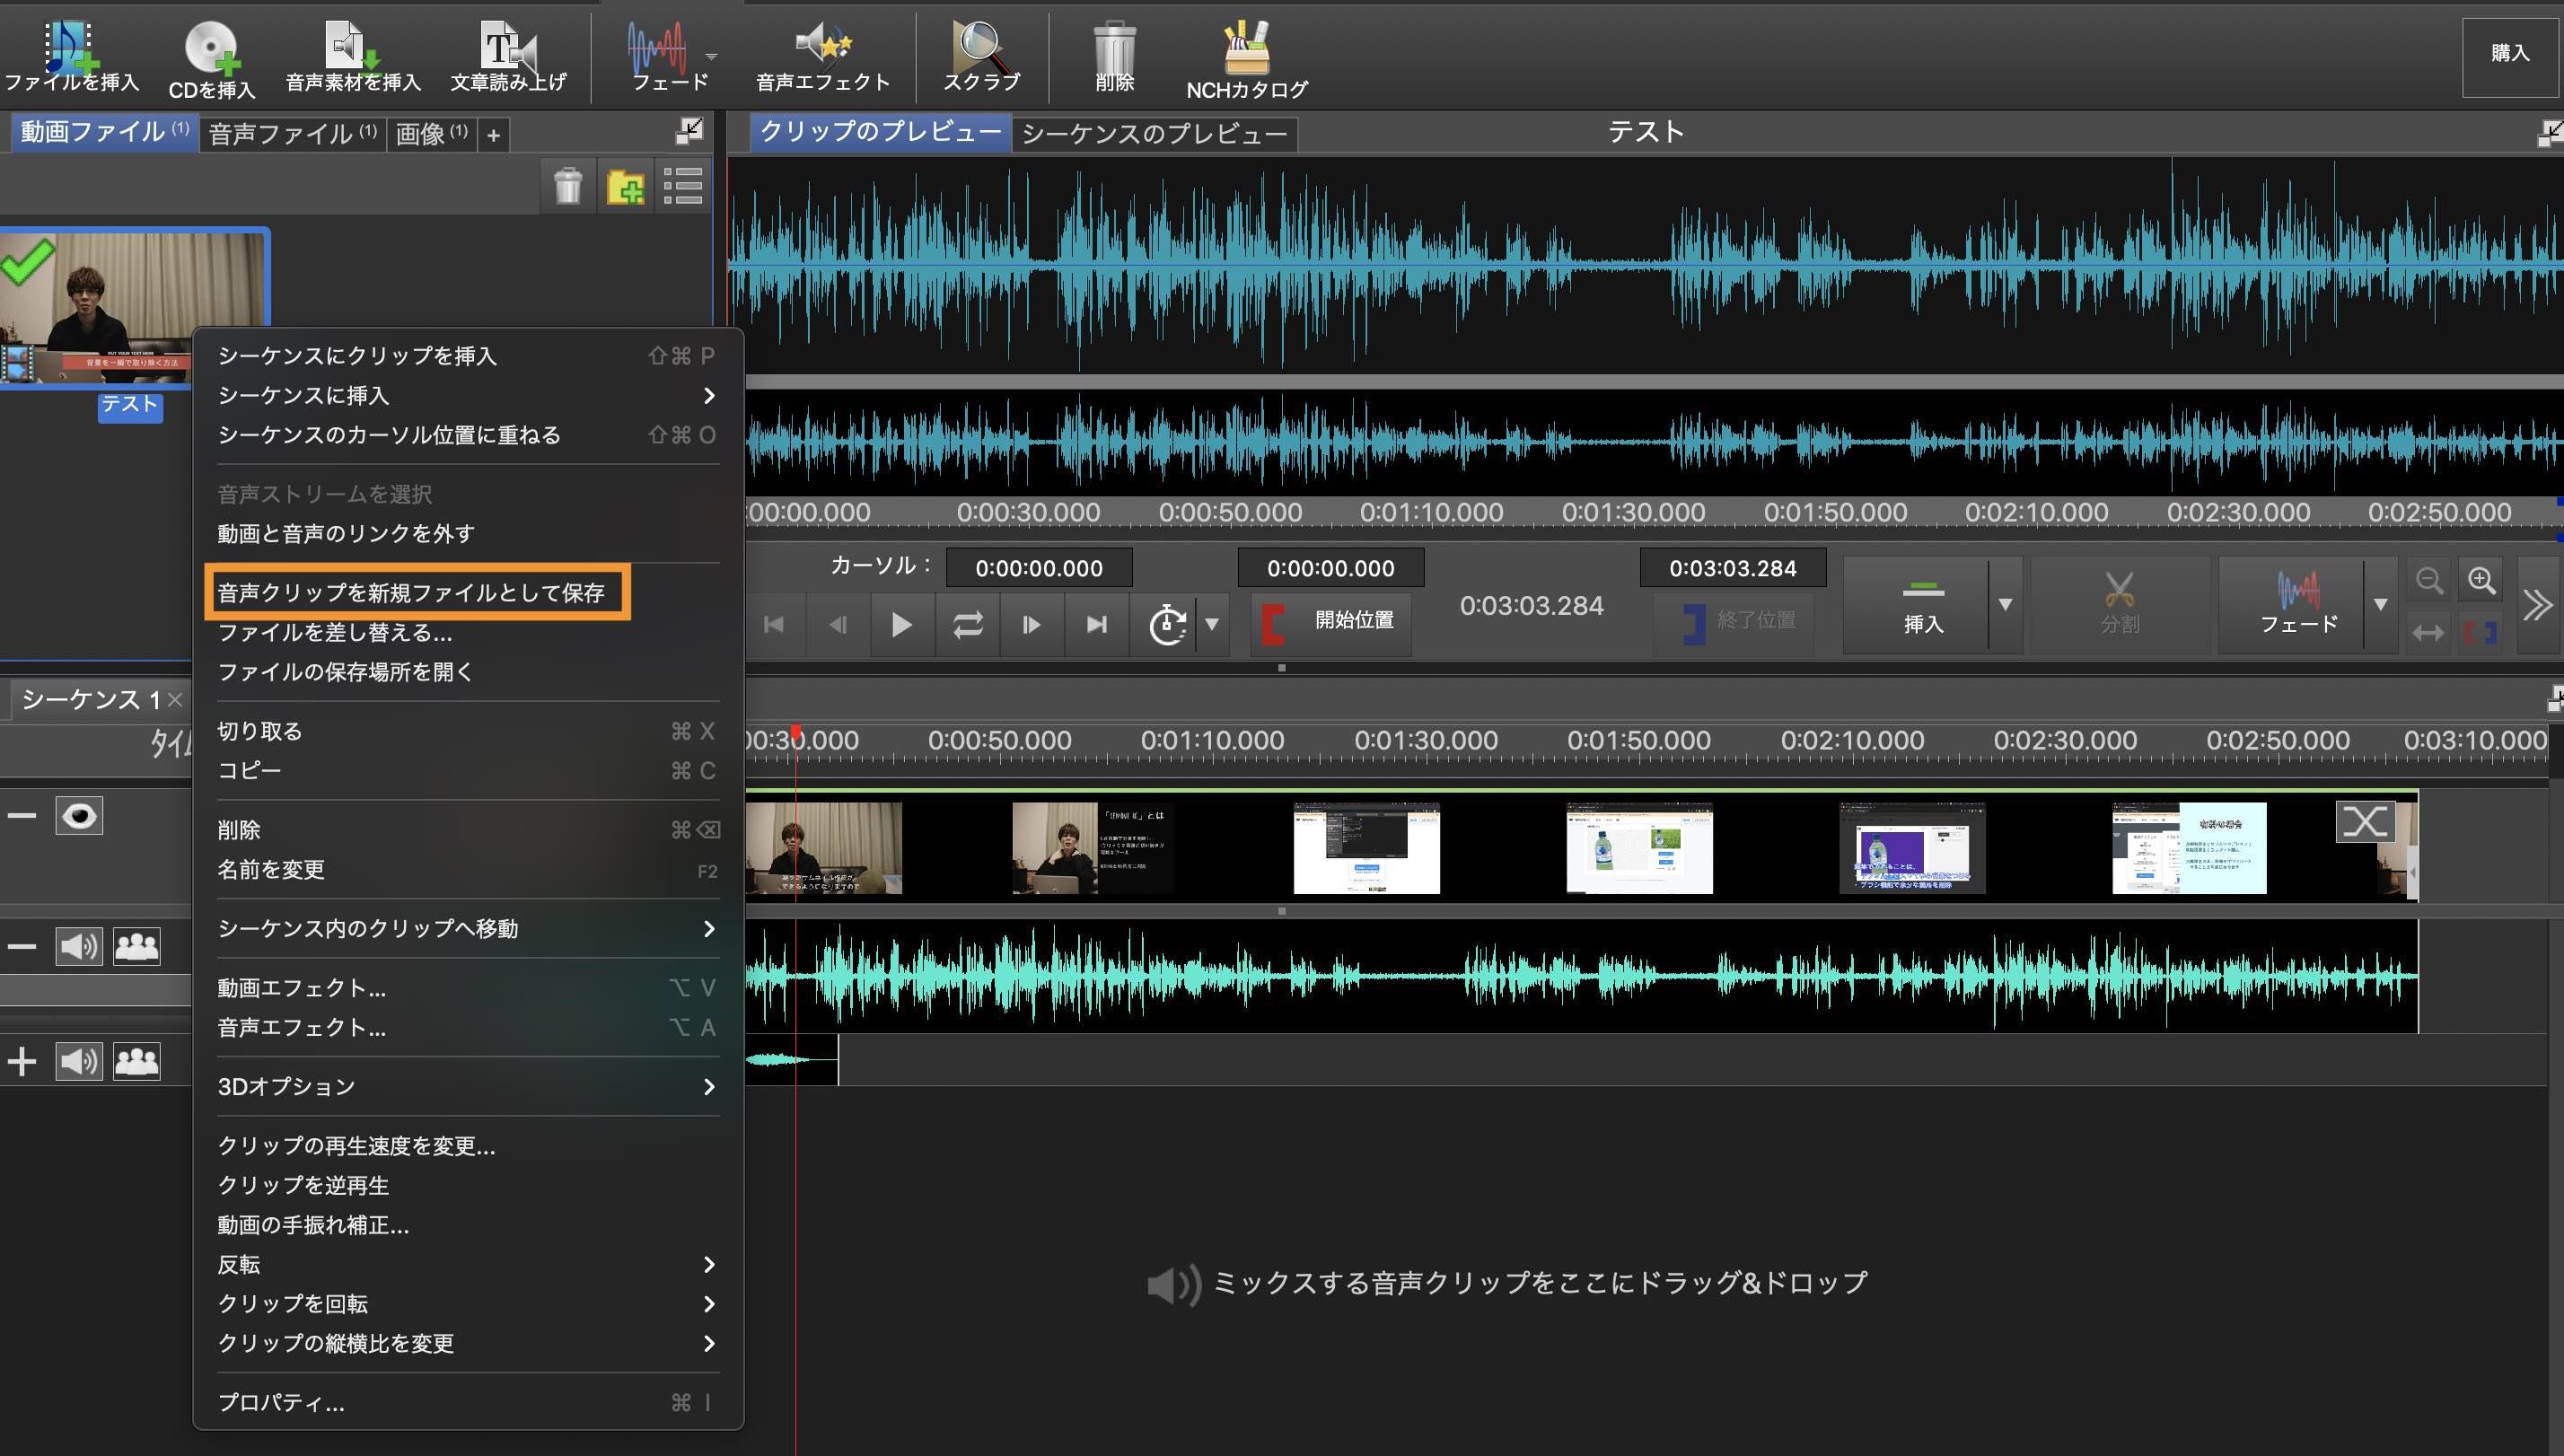 VideoPadで動画から音声だけを抽出して編集する方法